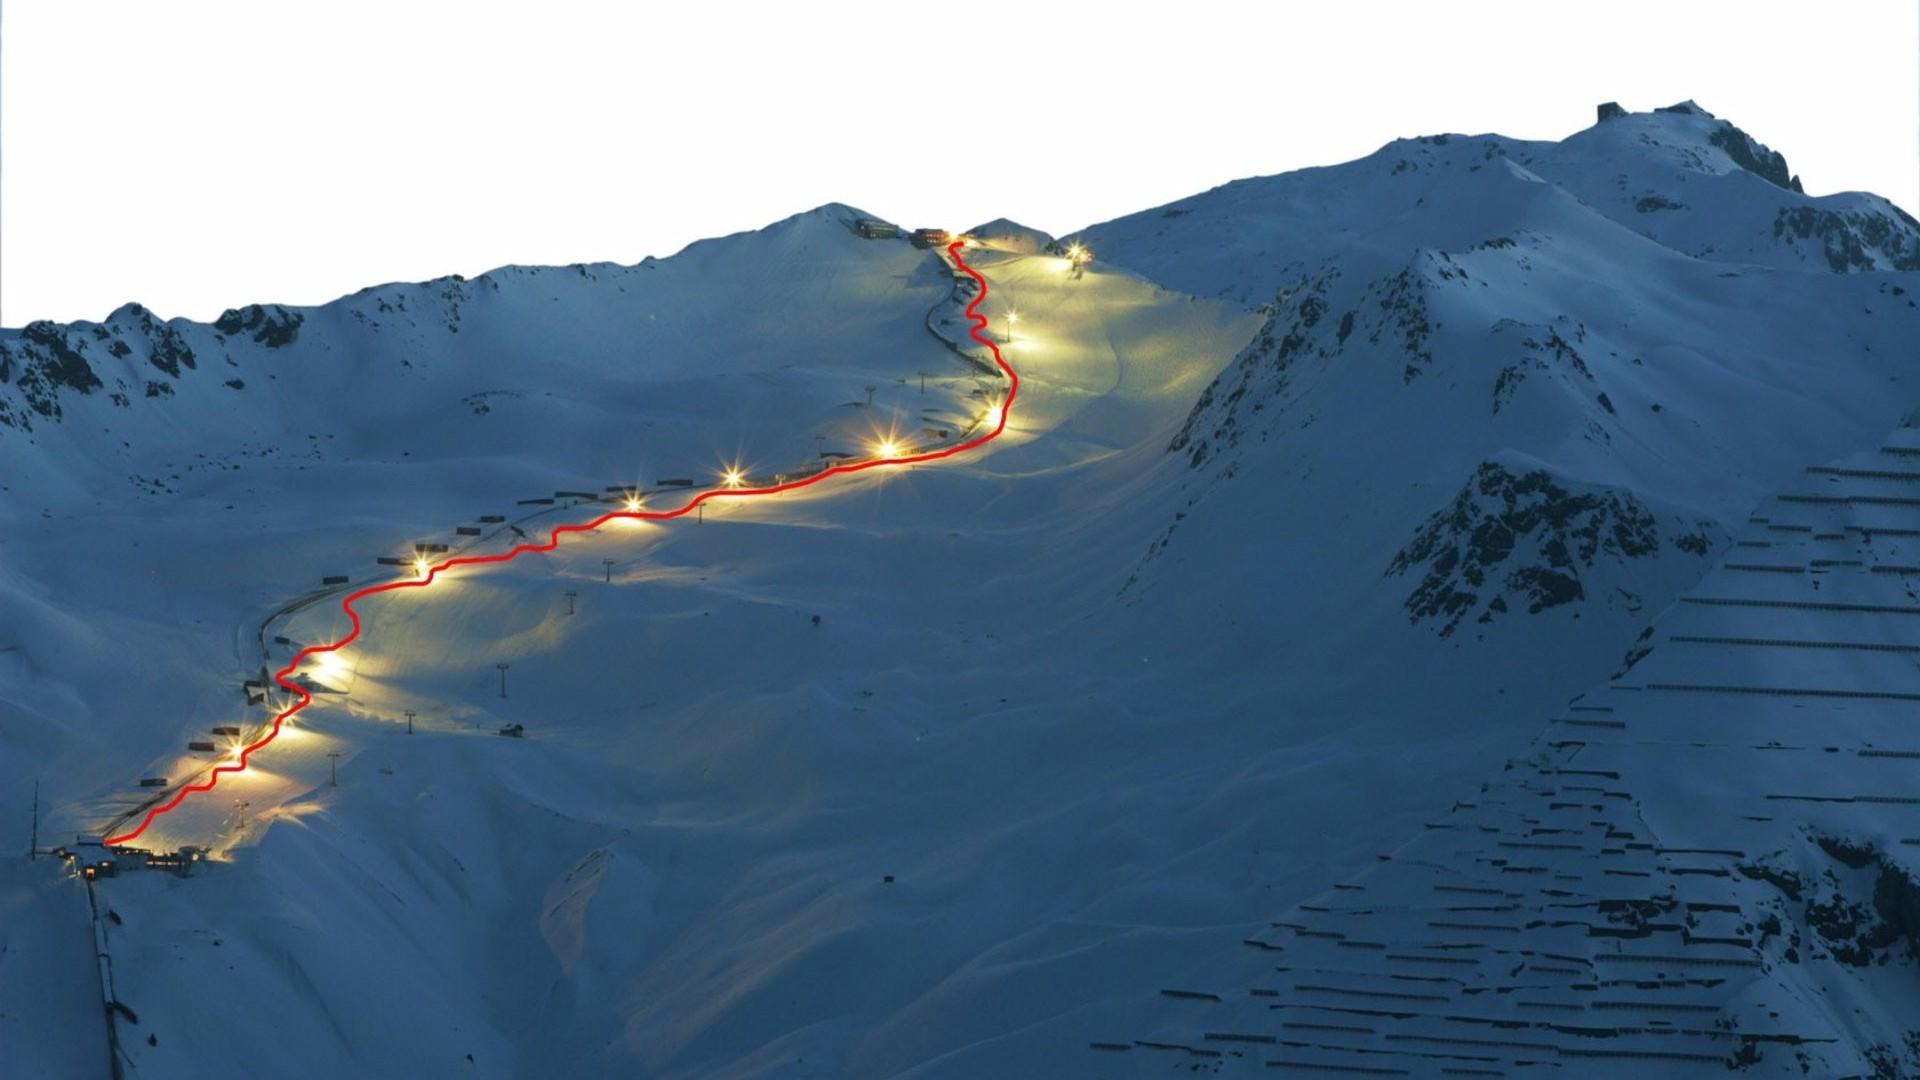 Ski slope HD Wallpaper 1920x1080 Ski slope HD Wallpaper 1920x1200 1920x1080